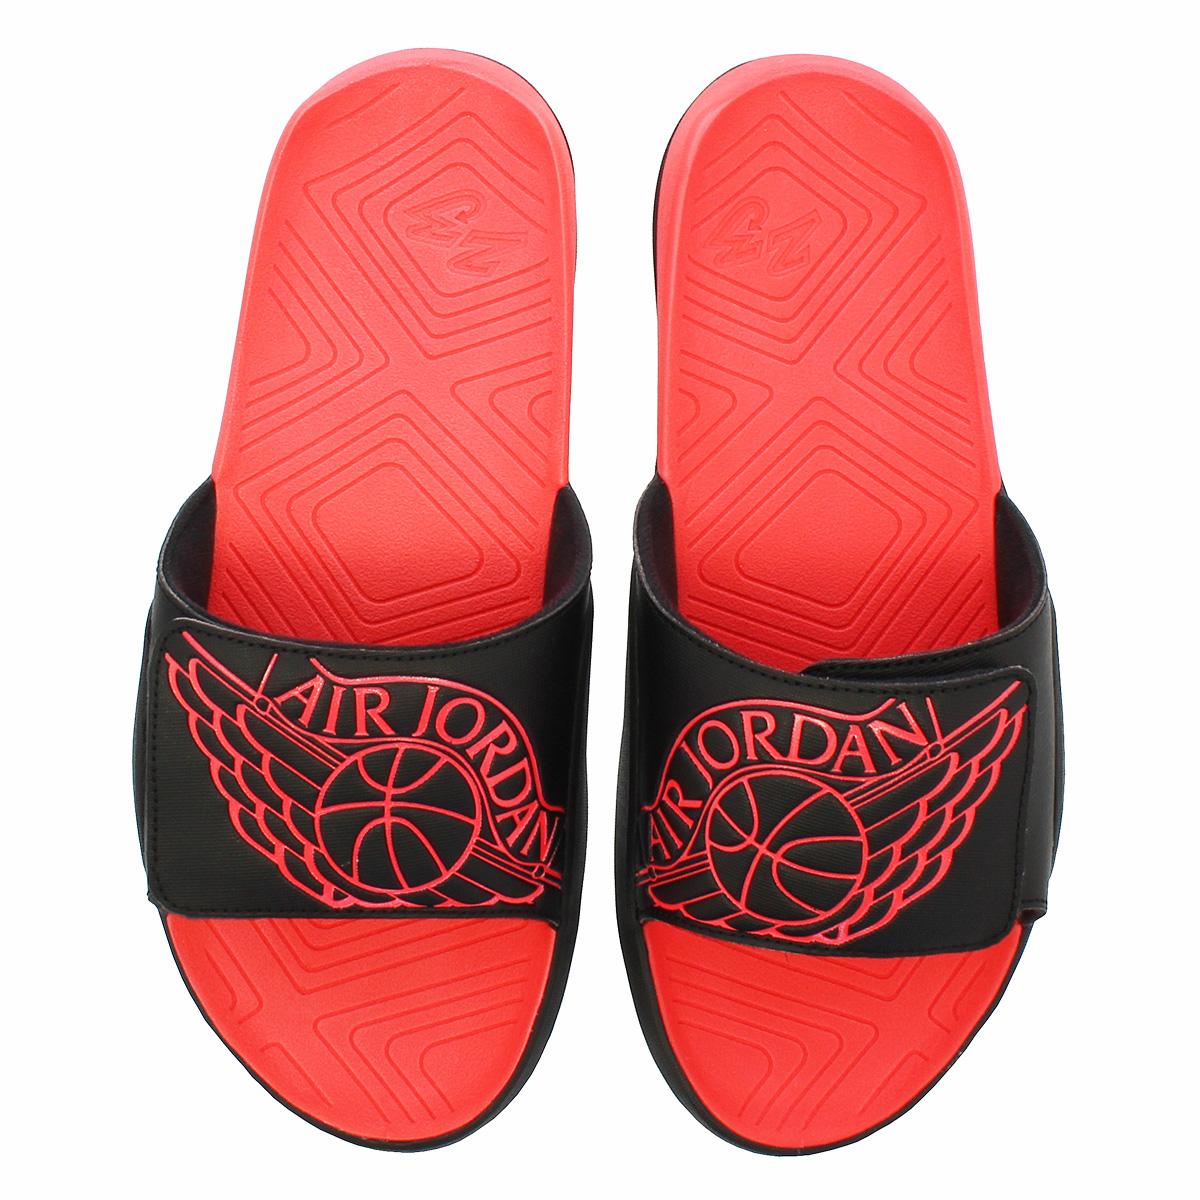 d1a9244e589b LOWTEX PLUS  NIKE JORDAN HYDRO 7 Nike Jordan high mud 7 BLACK ...